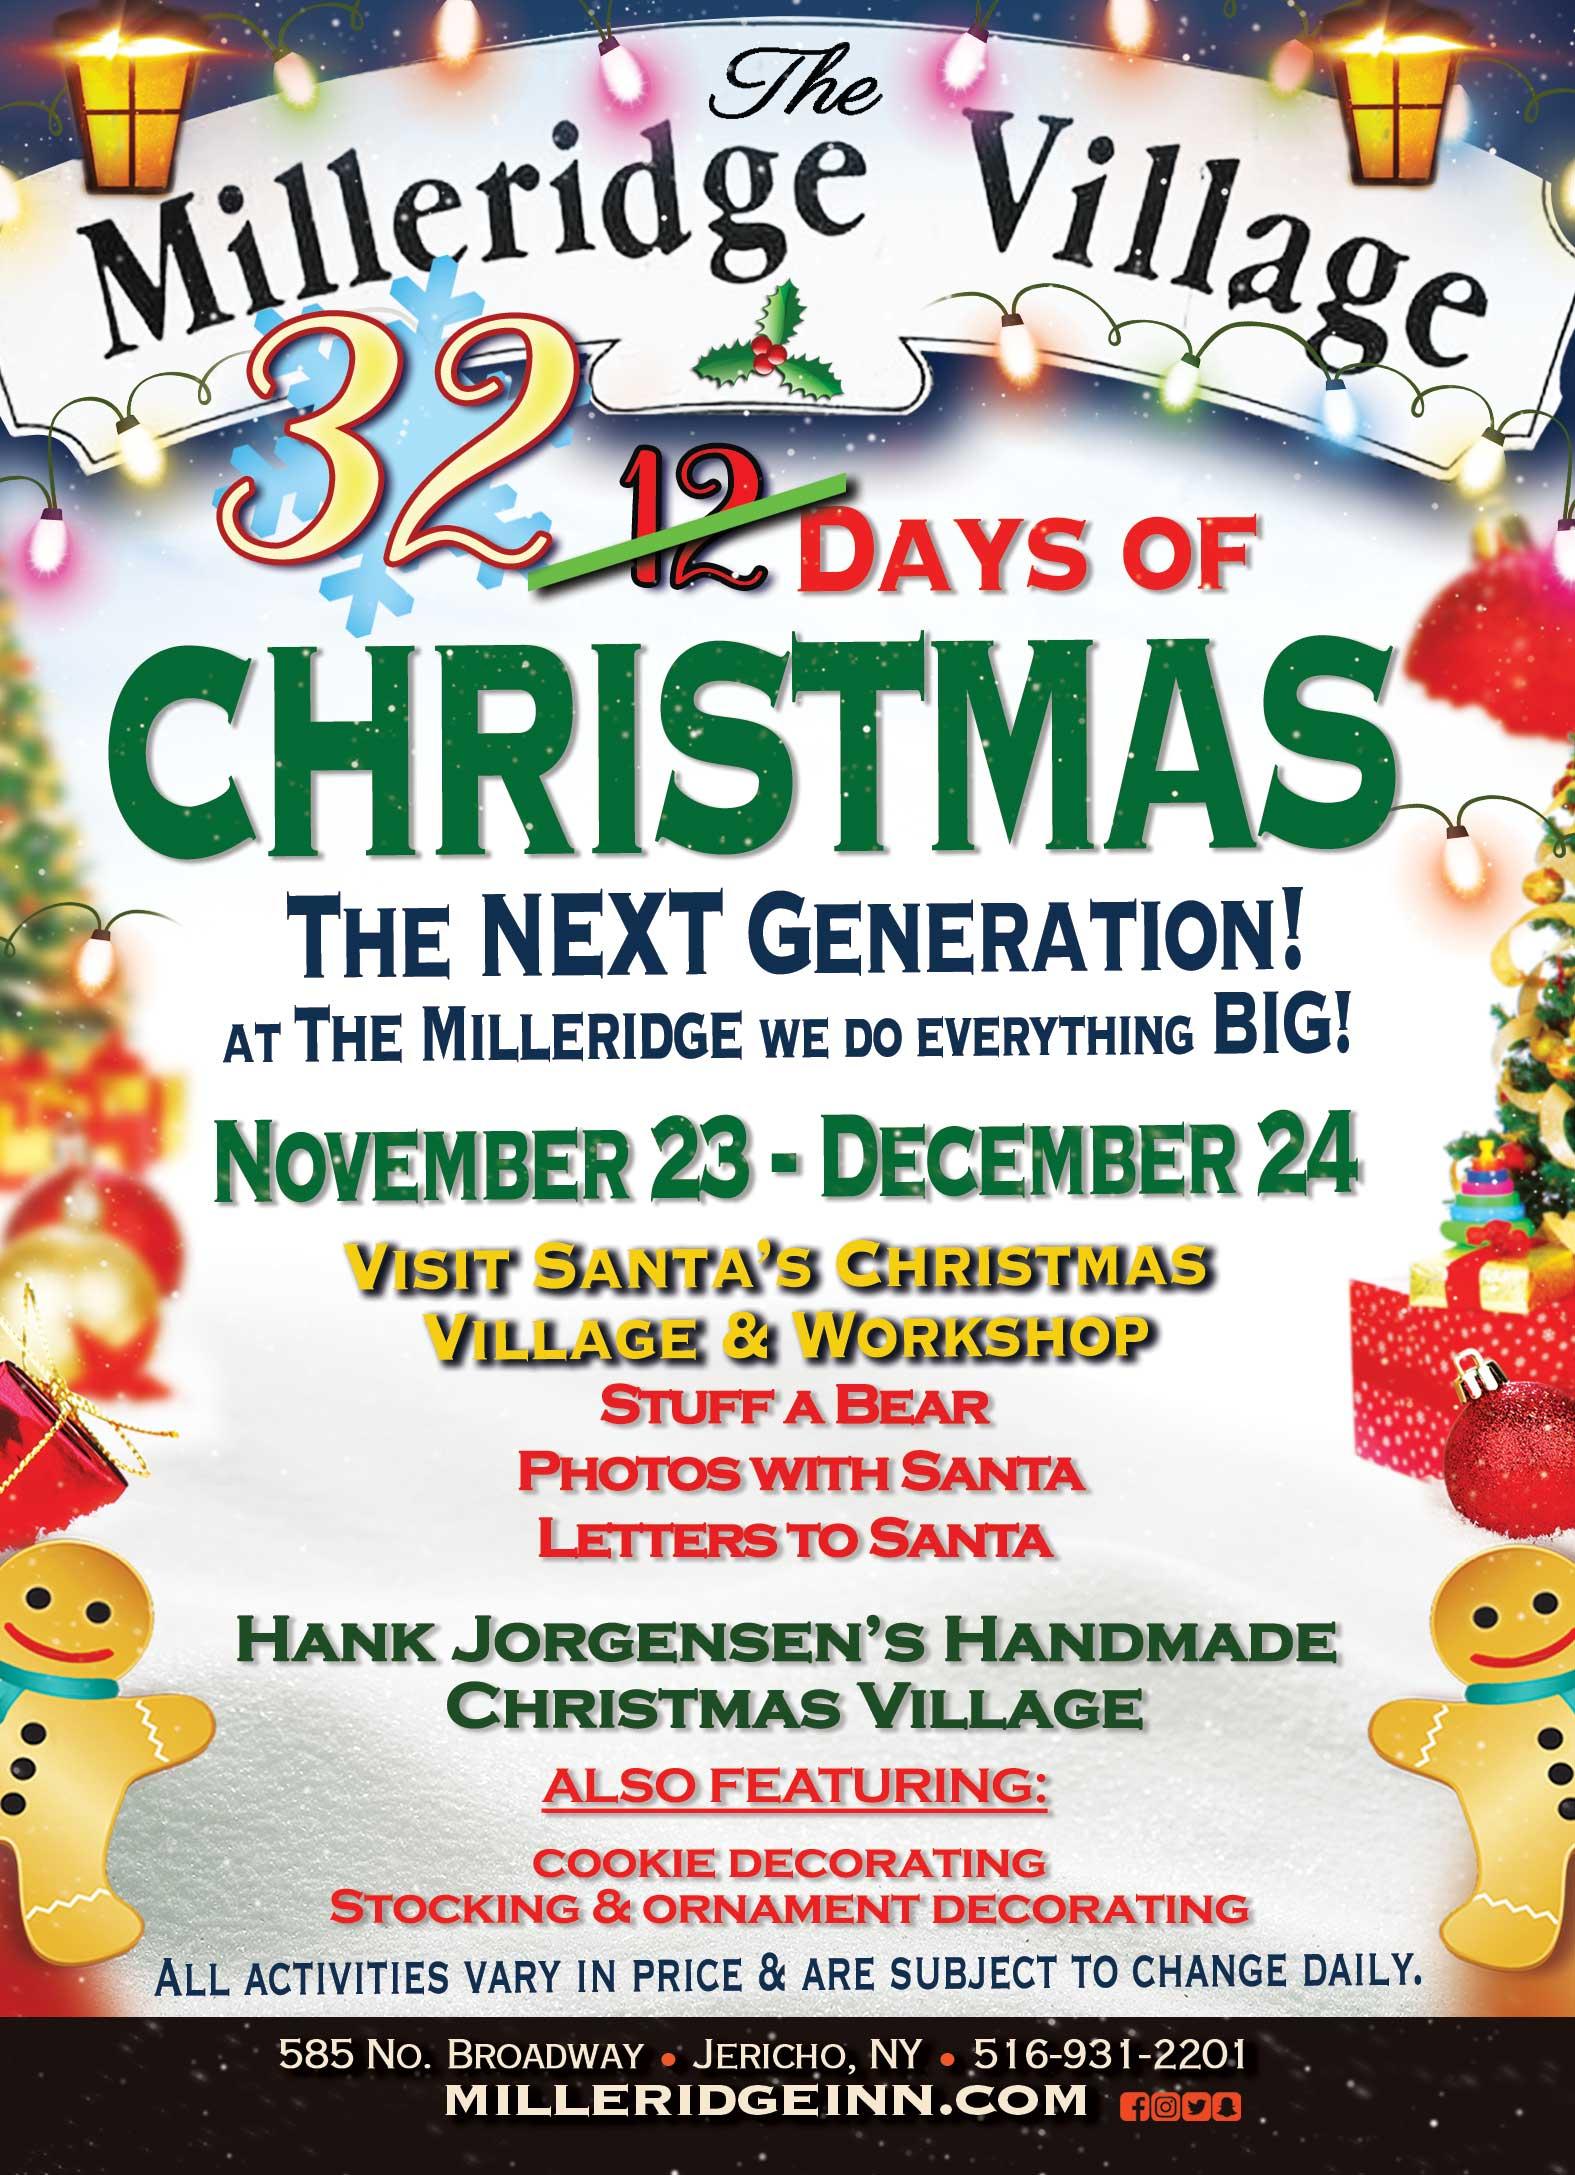 Milleridge Inn Christmas Village 2018.Milleridge Village 32 Days Of Christmas Pennysaver